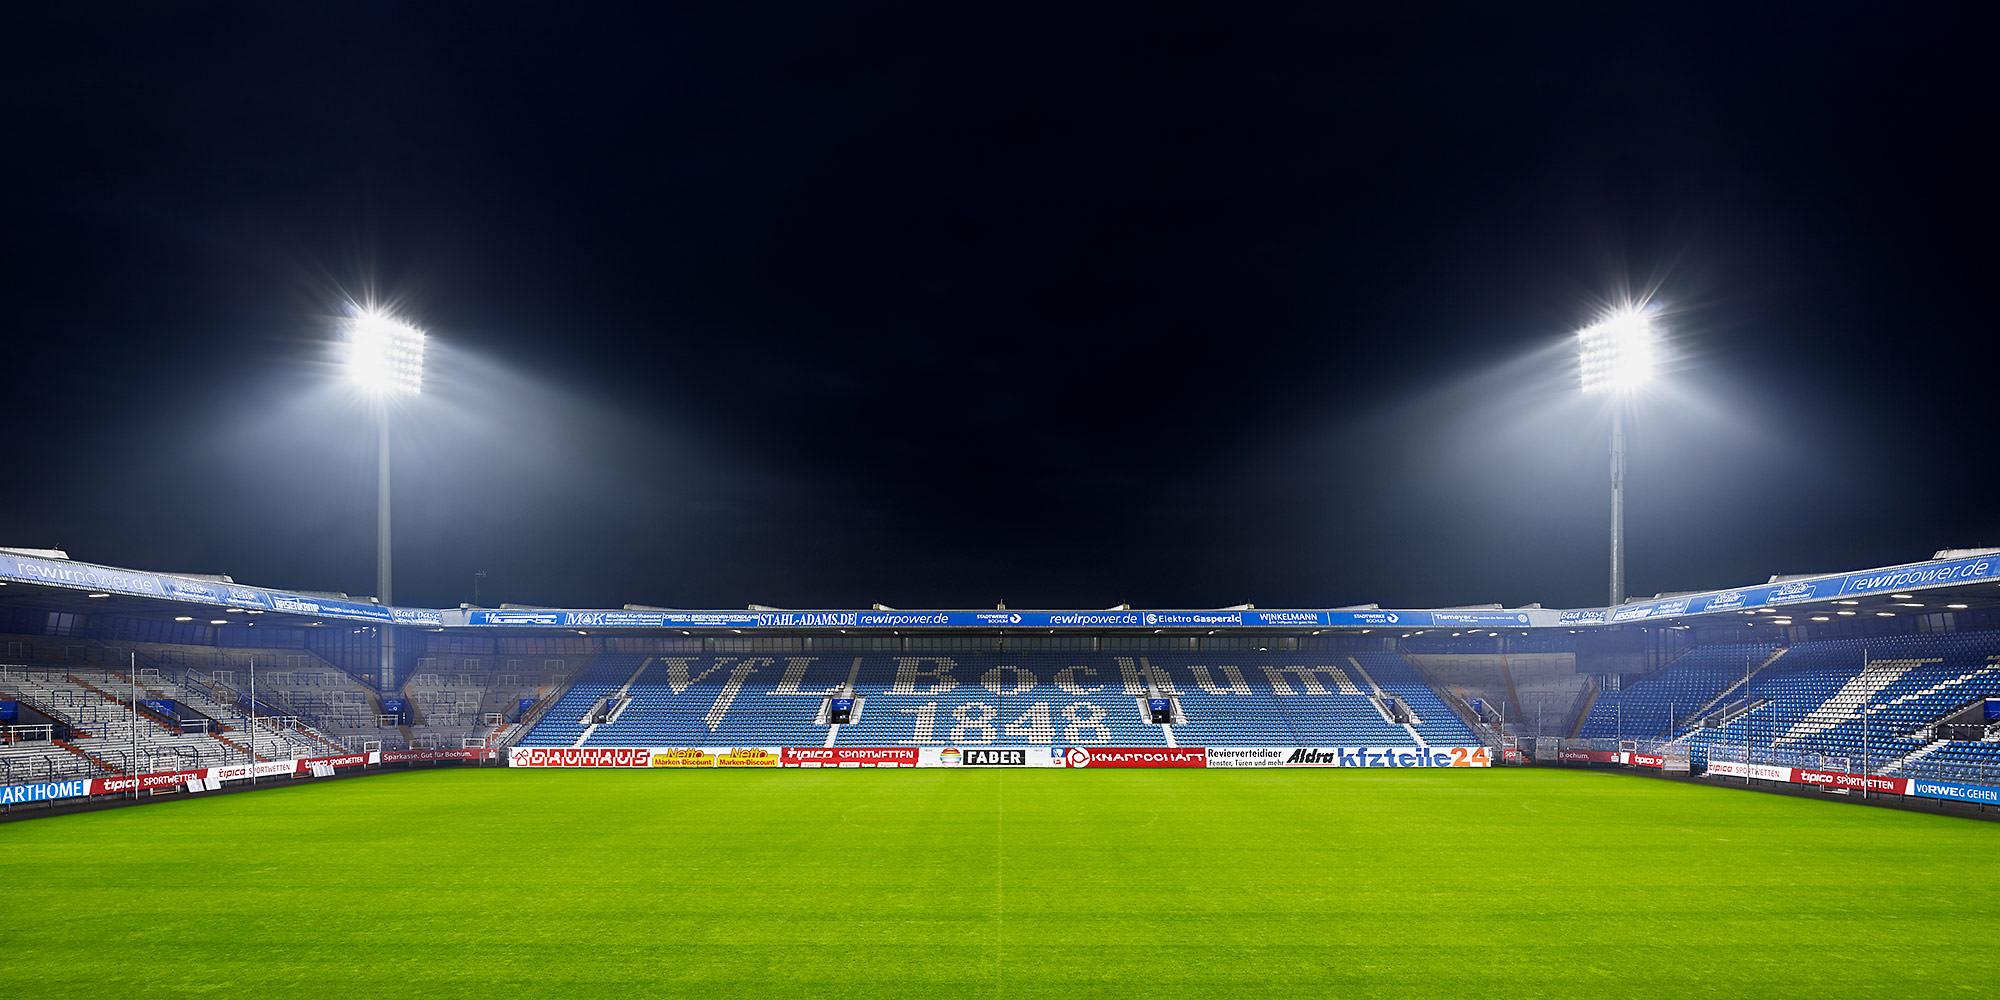 Stadion, Bochum @ Philip Kistner